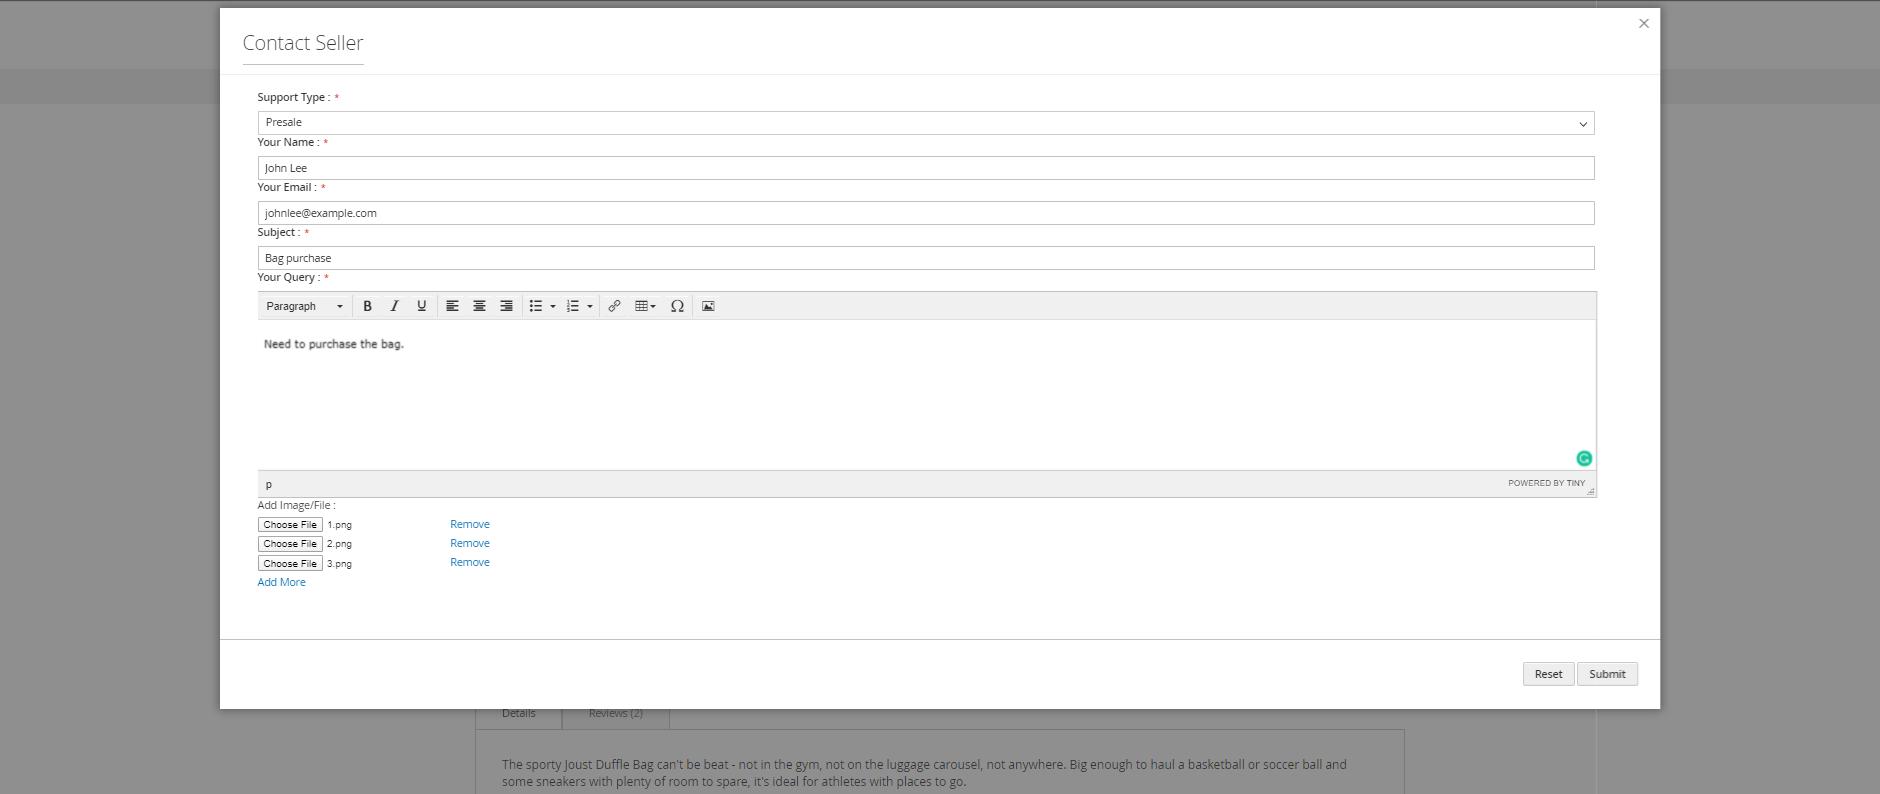 Buyer Seller Communication-contact_seller-1